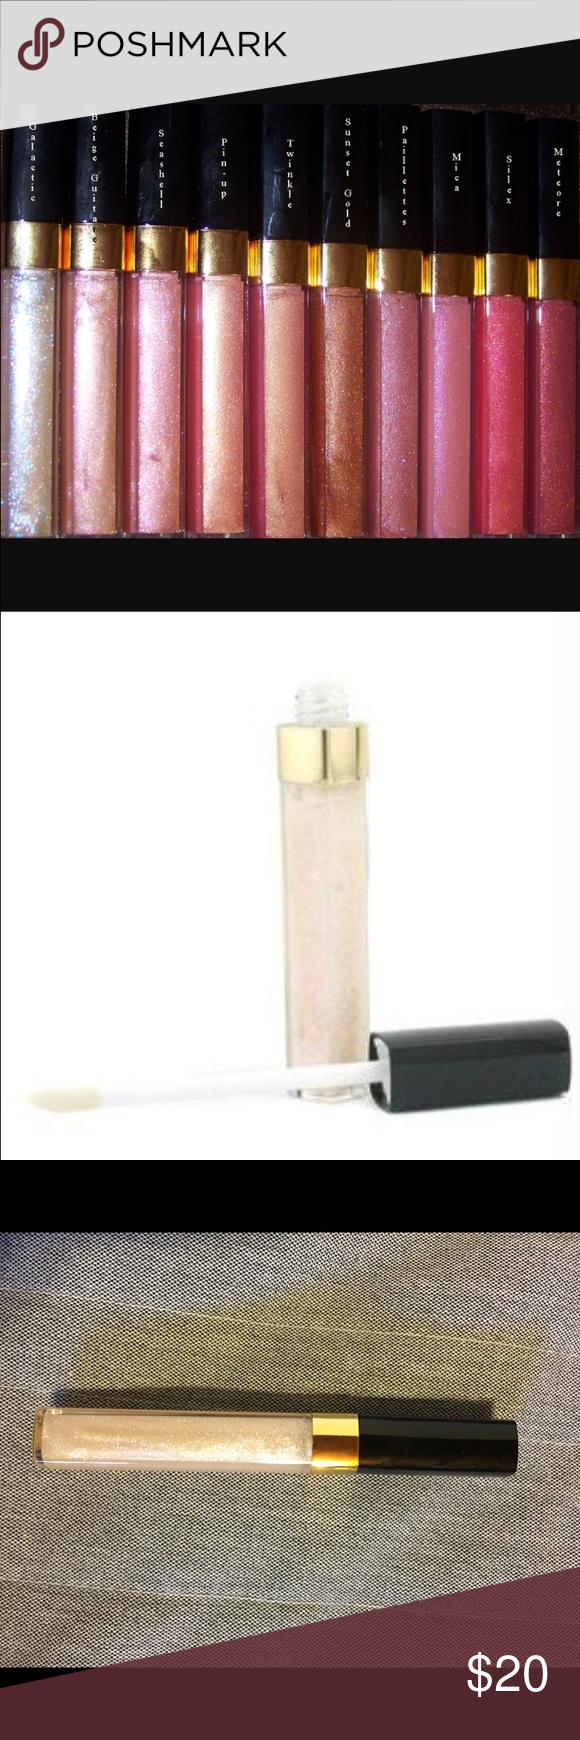 Chanel gloss No 98, brand new but no box, lower on ♏️ CHANEL Makeup Lip Balm & Gloss